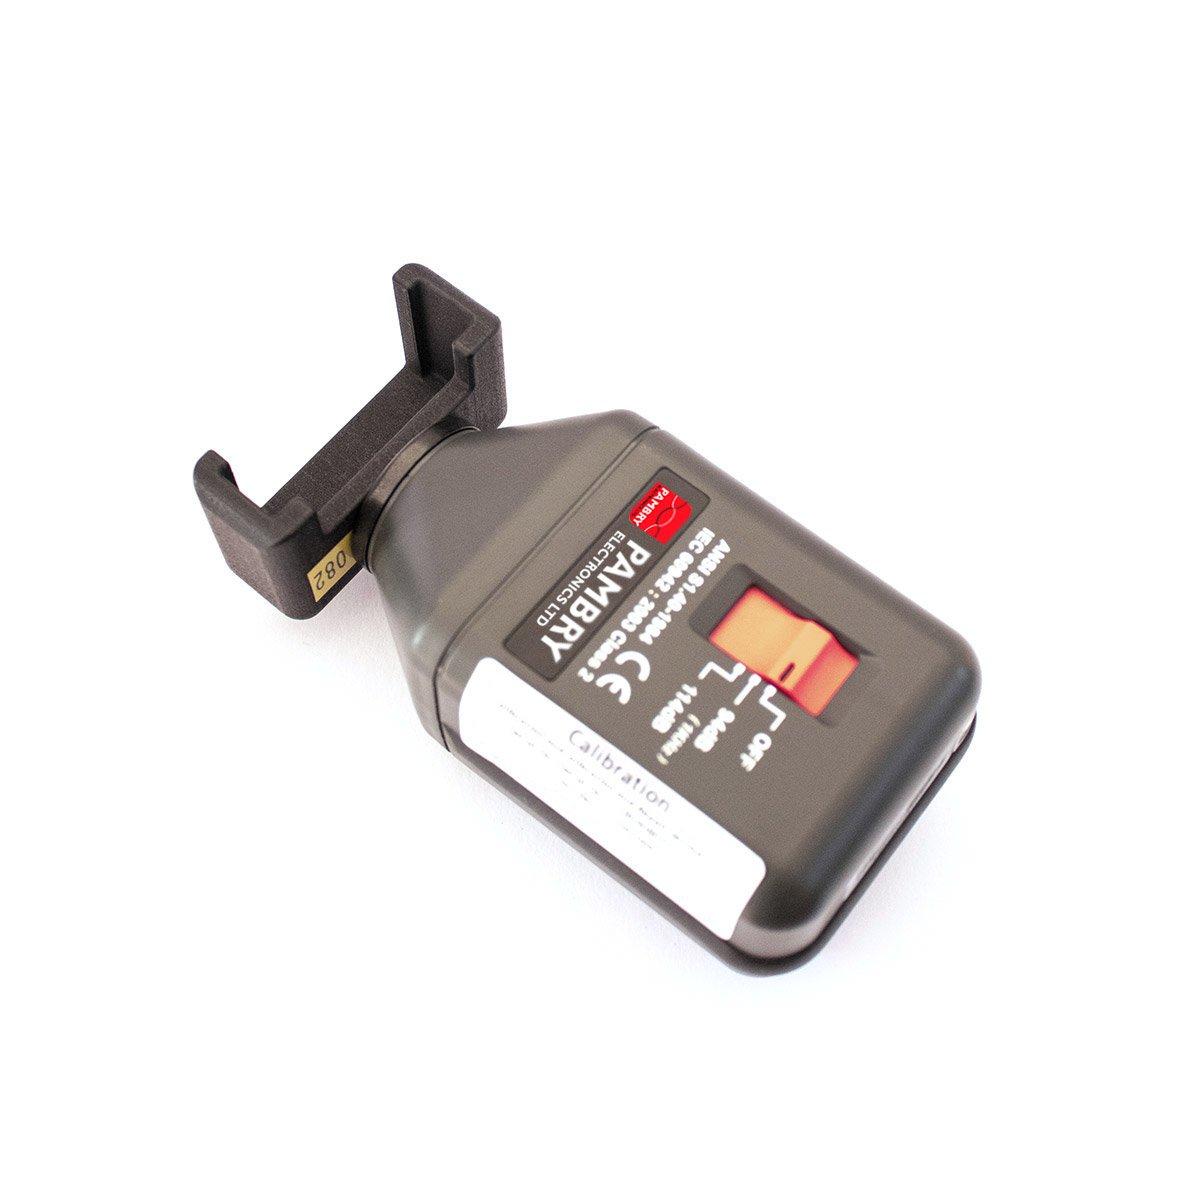 Listen Ear™ Internal Microphone Calibrator Adapter and Calibrator assembled